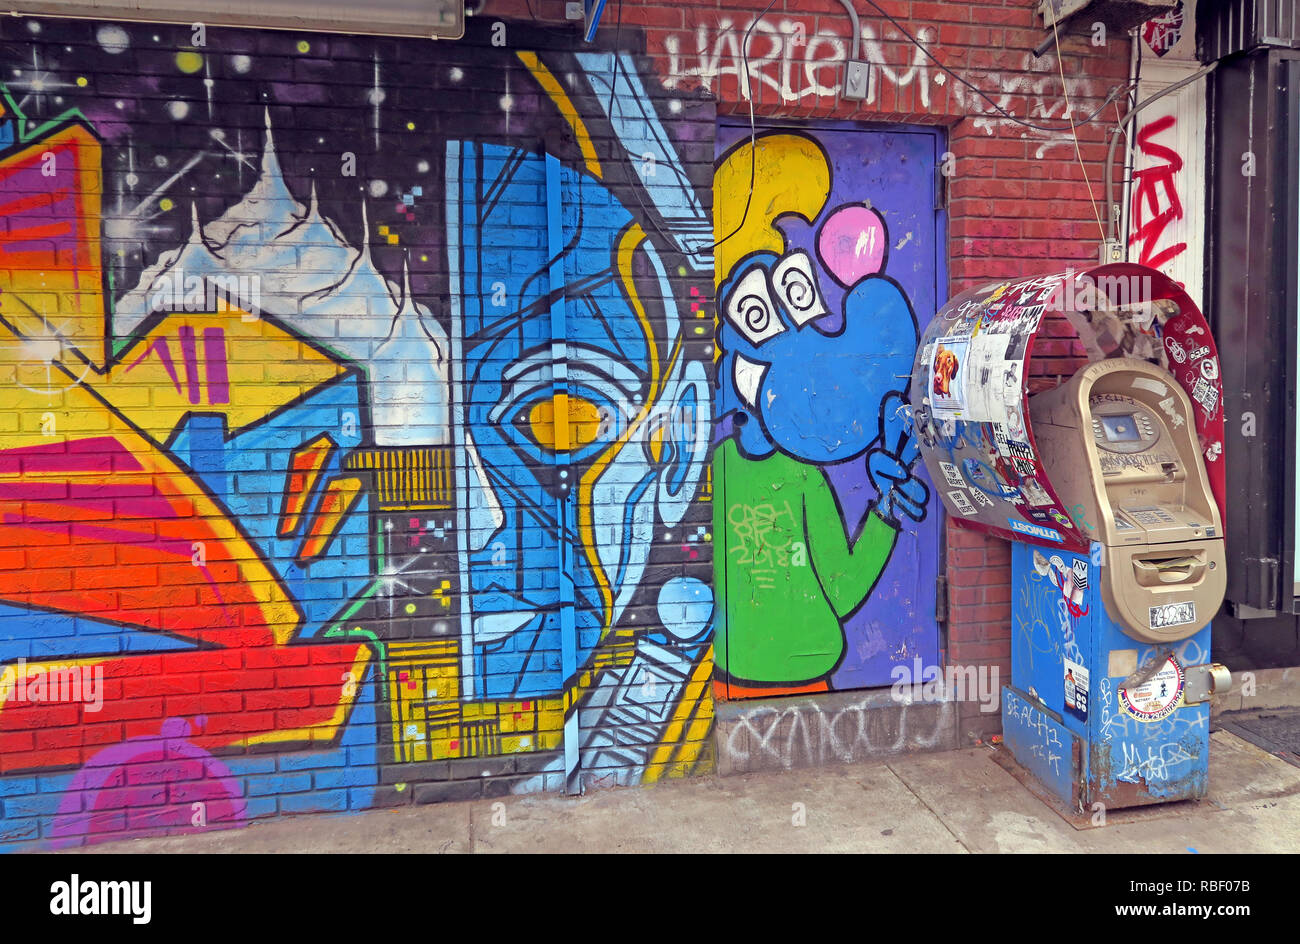 GoTonySmith,@HotpixUK,HotpixUK,NOHO NYC,NYC,New York City,St Marks Place,St Marks Place NYC,street,New York Street,USA,America,City Centre,city,centre,center,city center,East Village,Eastvillage,Cash Machine,AutoTeller,street cash machine,Manhattan,New York,NY,Harlem